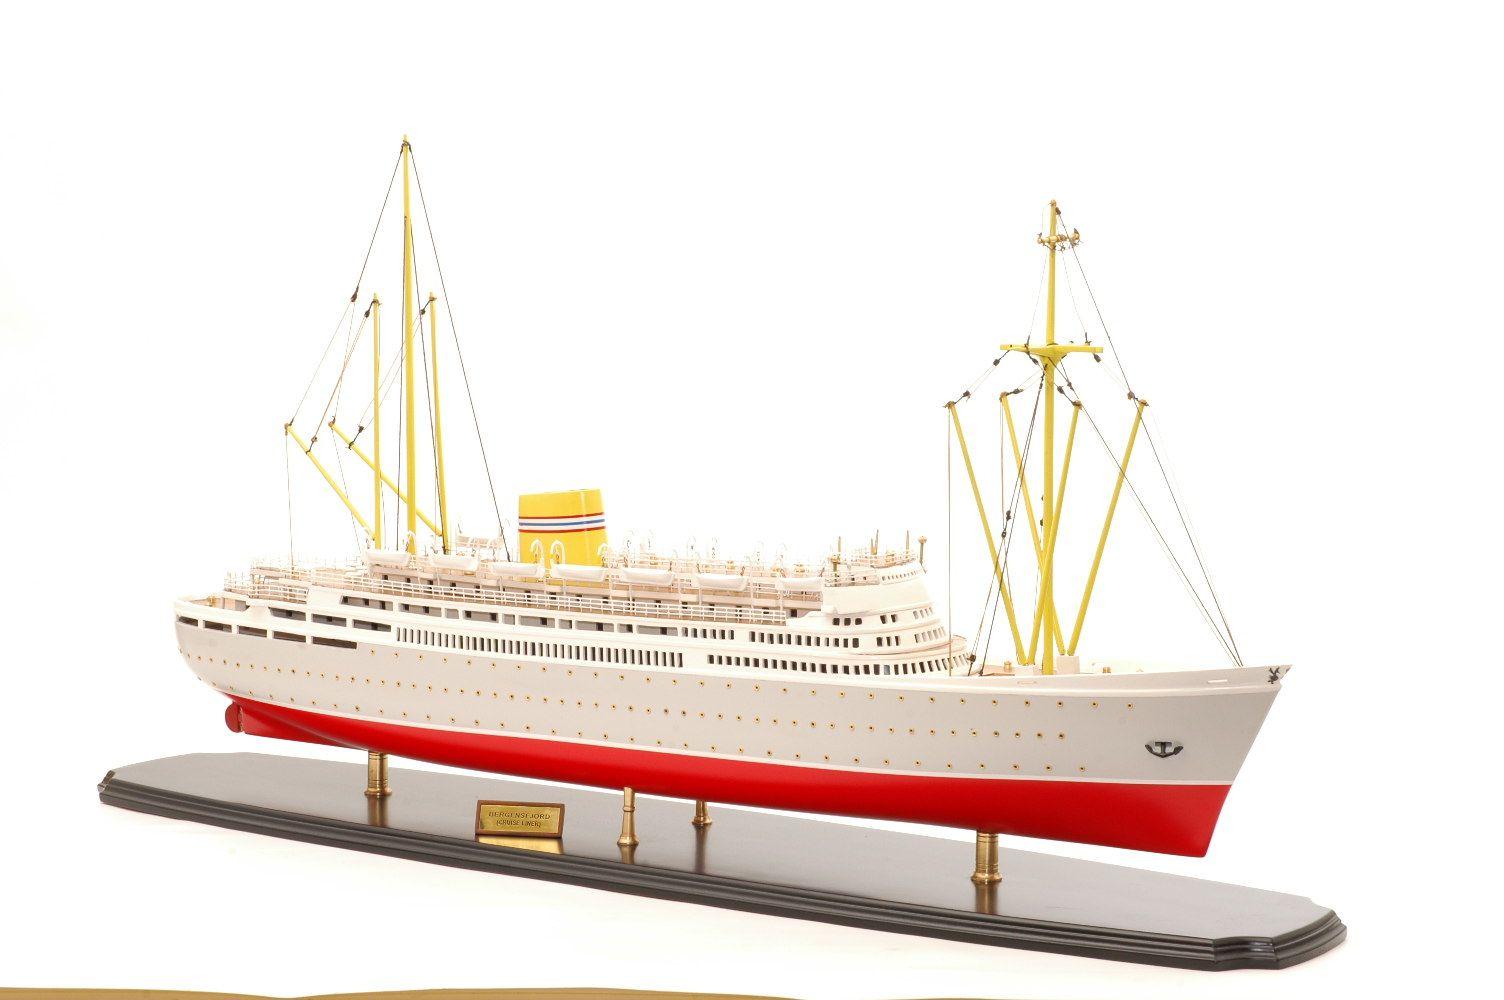 549-6431-Bergensfjord-model-ship